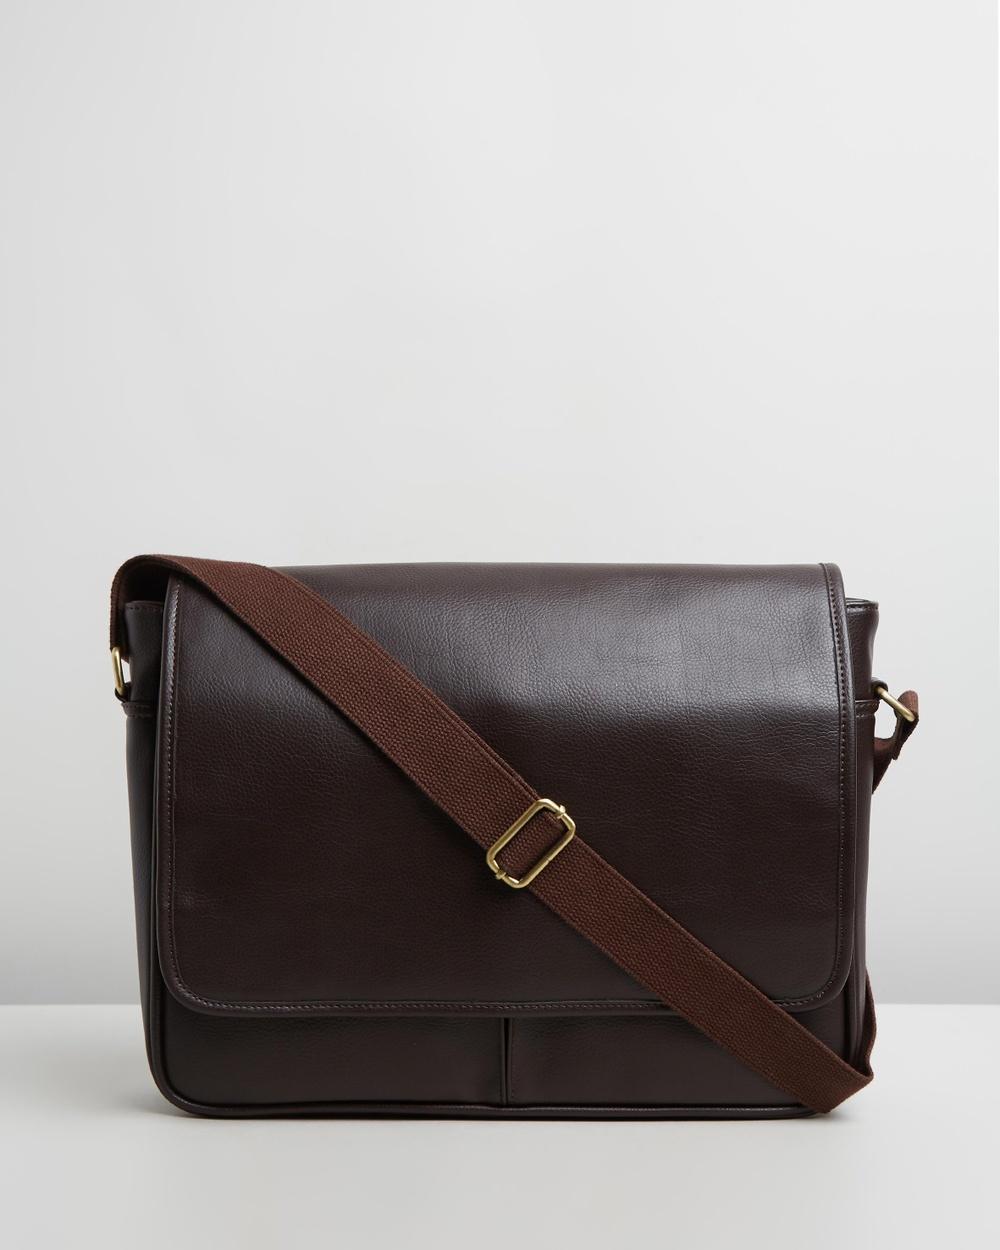 Staple Superior Bennet Messenger Bags Chocolate